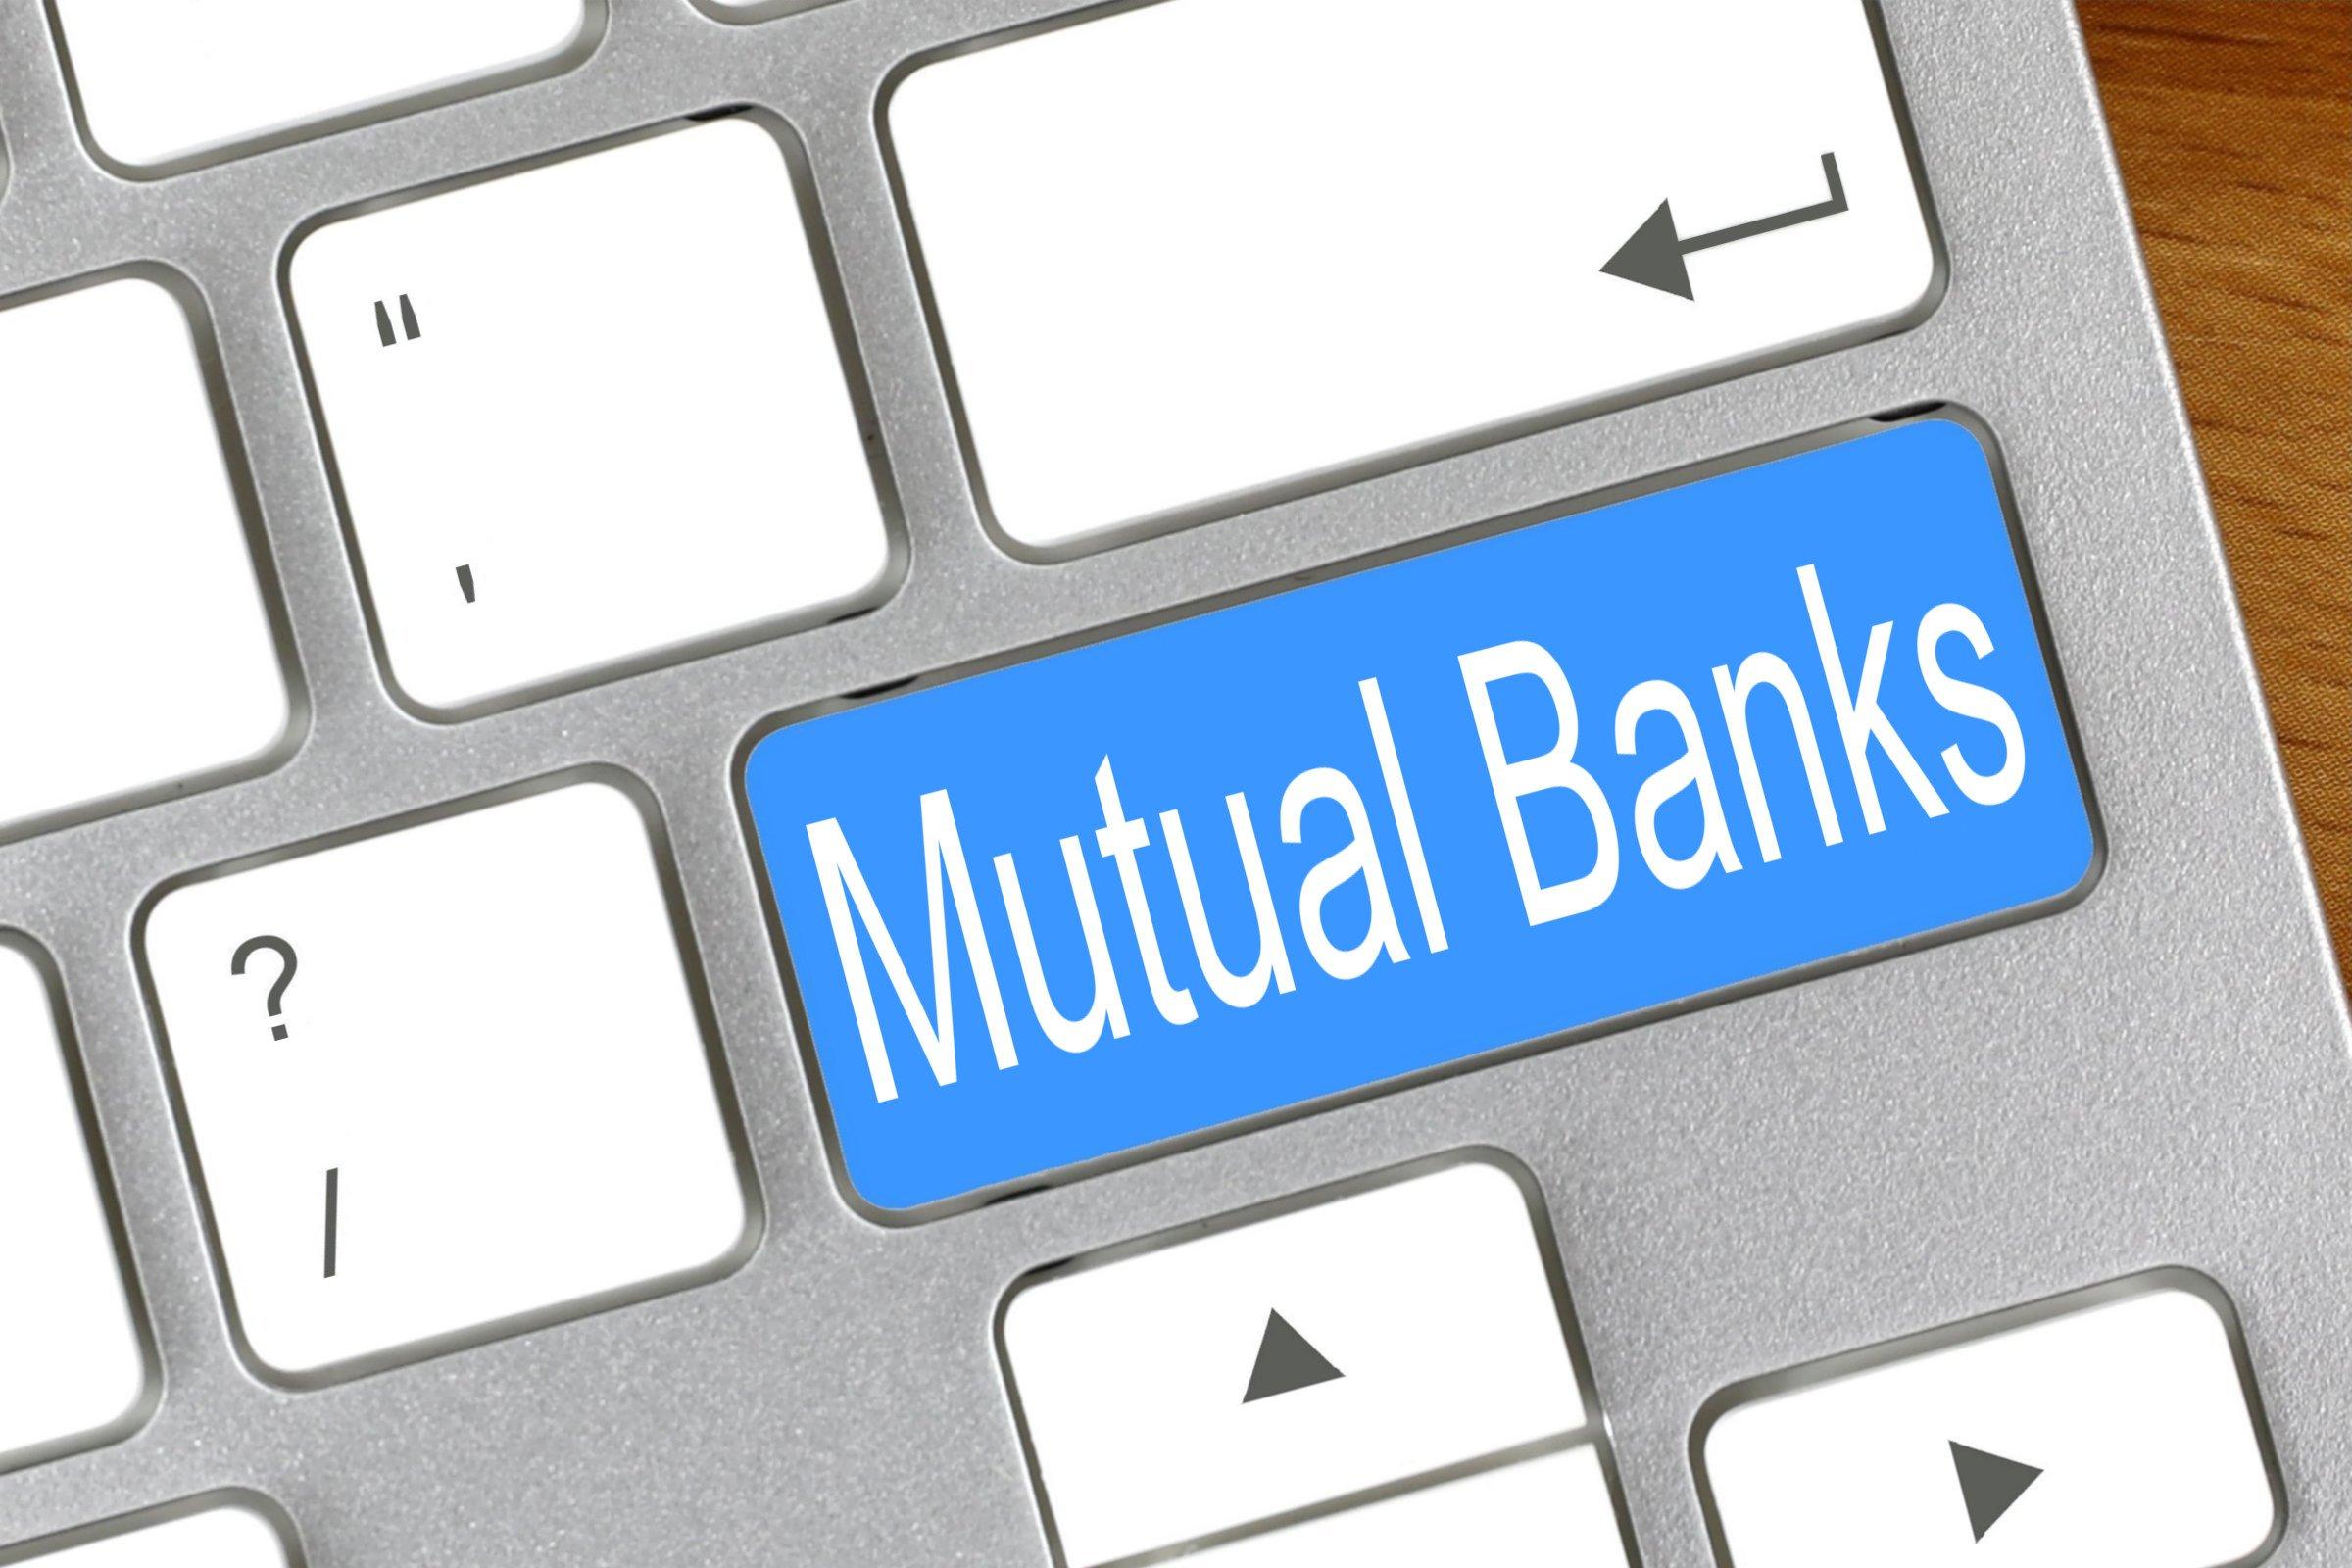 Mutual Banks